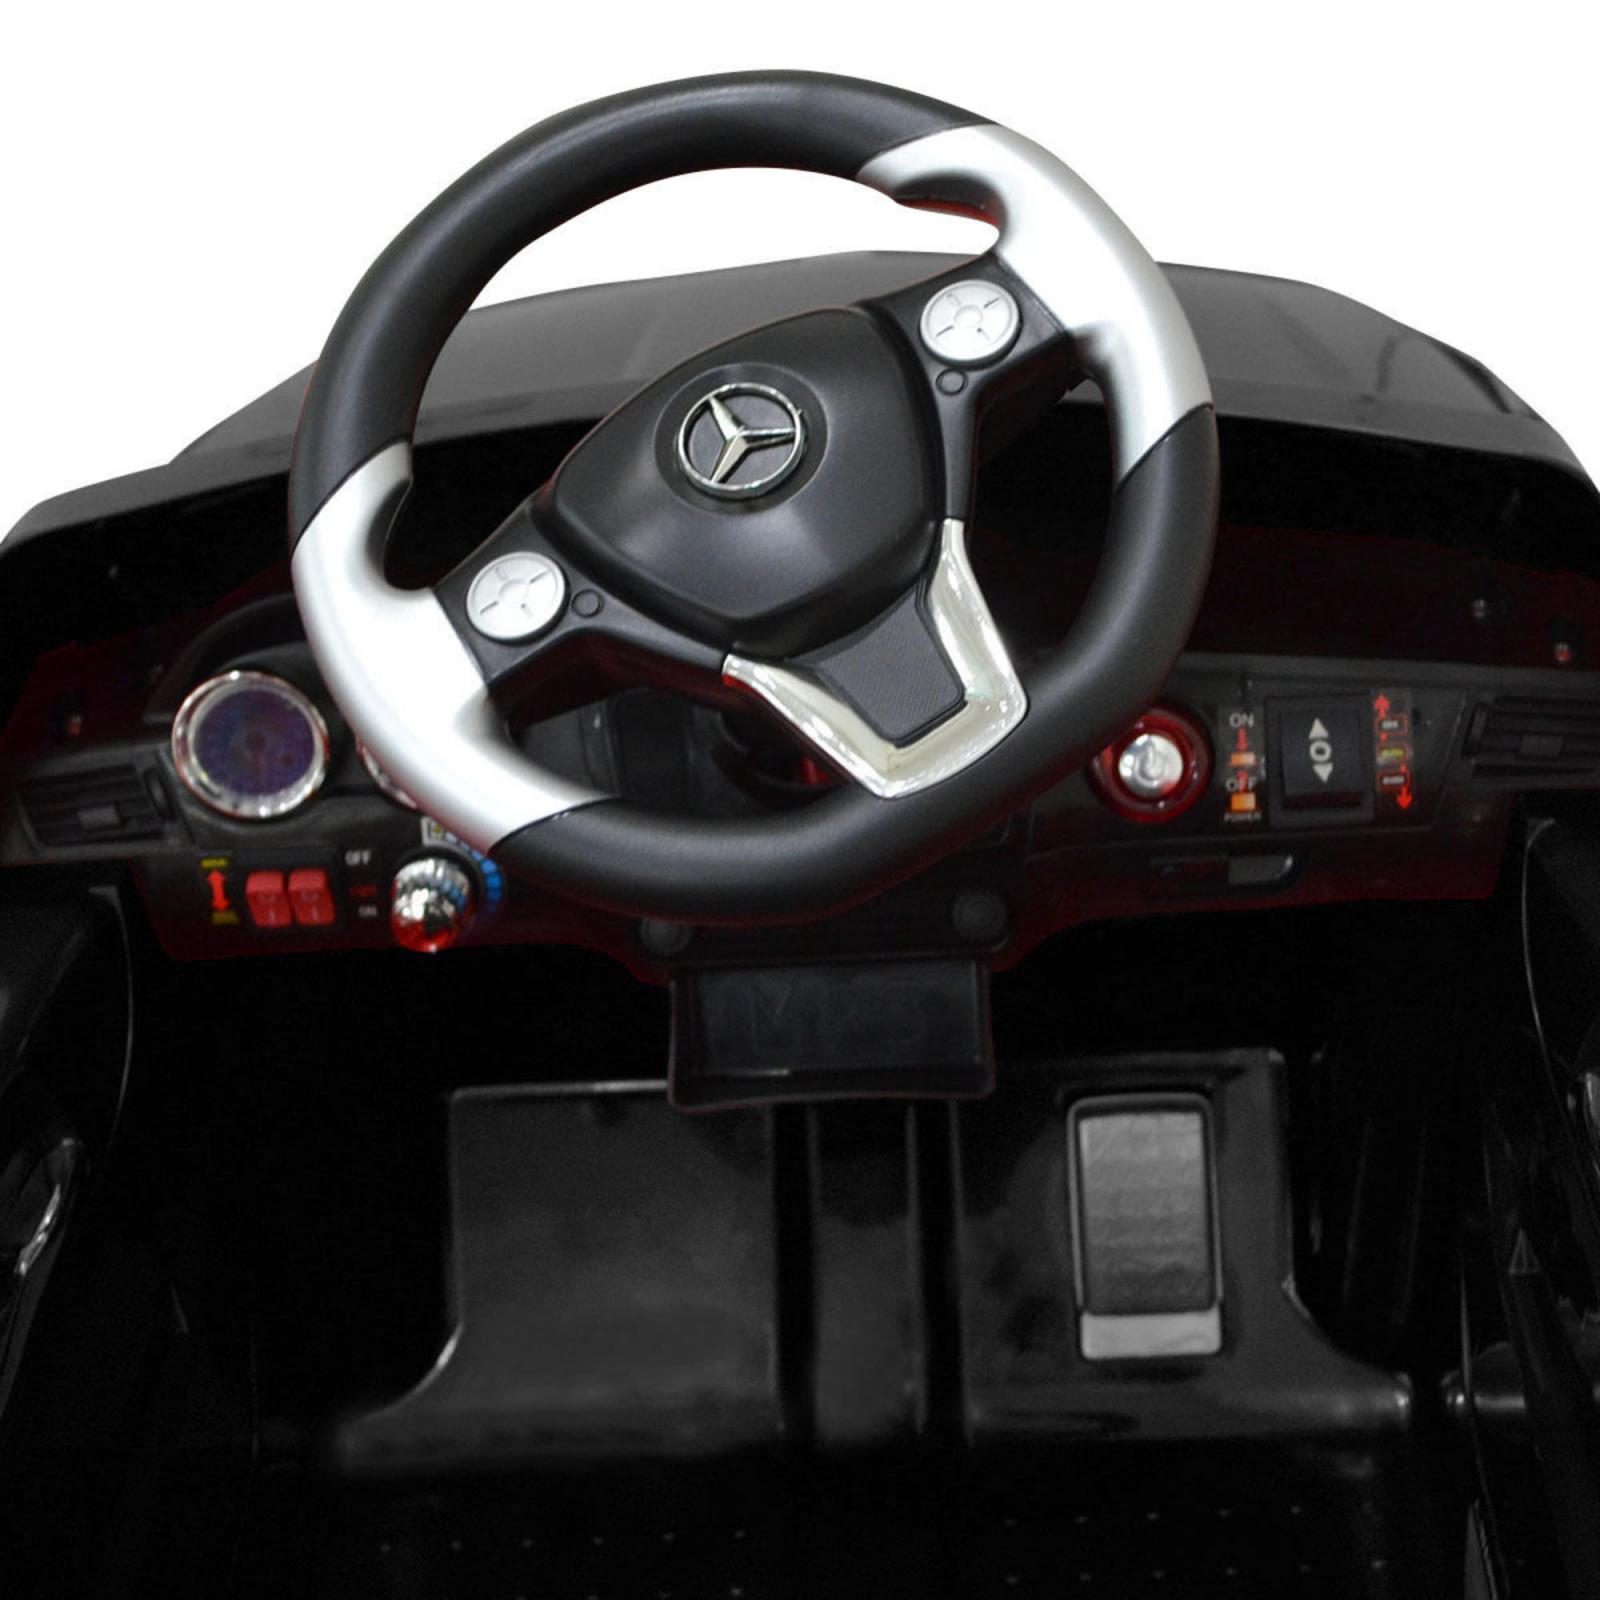 Licensed Mercedes Benz ML-350 6V Kids Battery Powered Ride On Car - Black